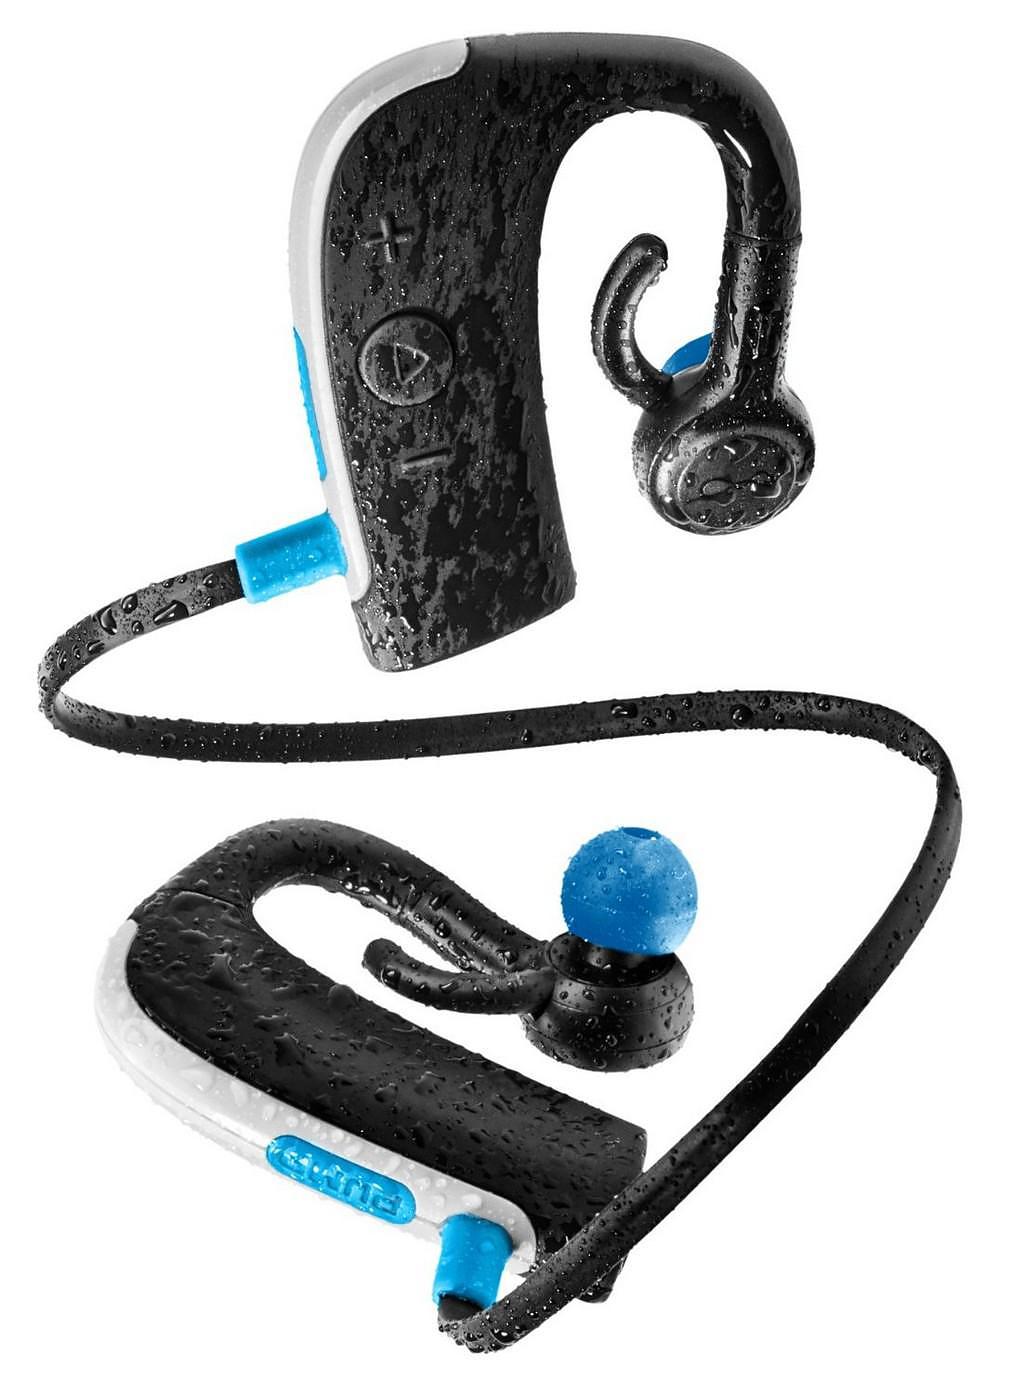 Blueant Pump HD bluetooth wireless sportsbuds (4)